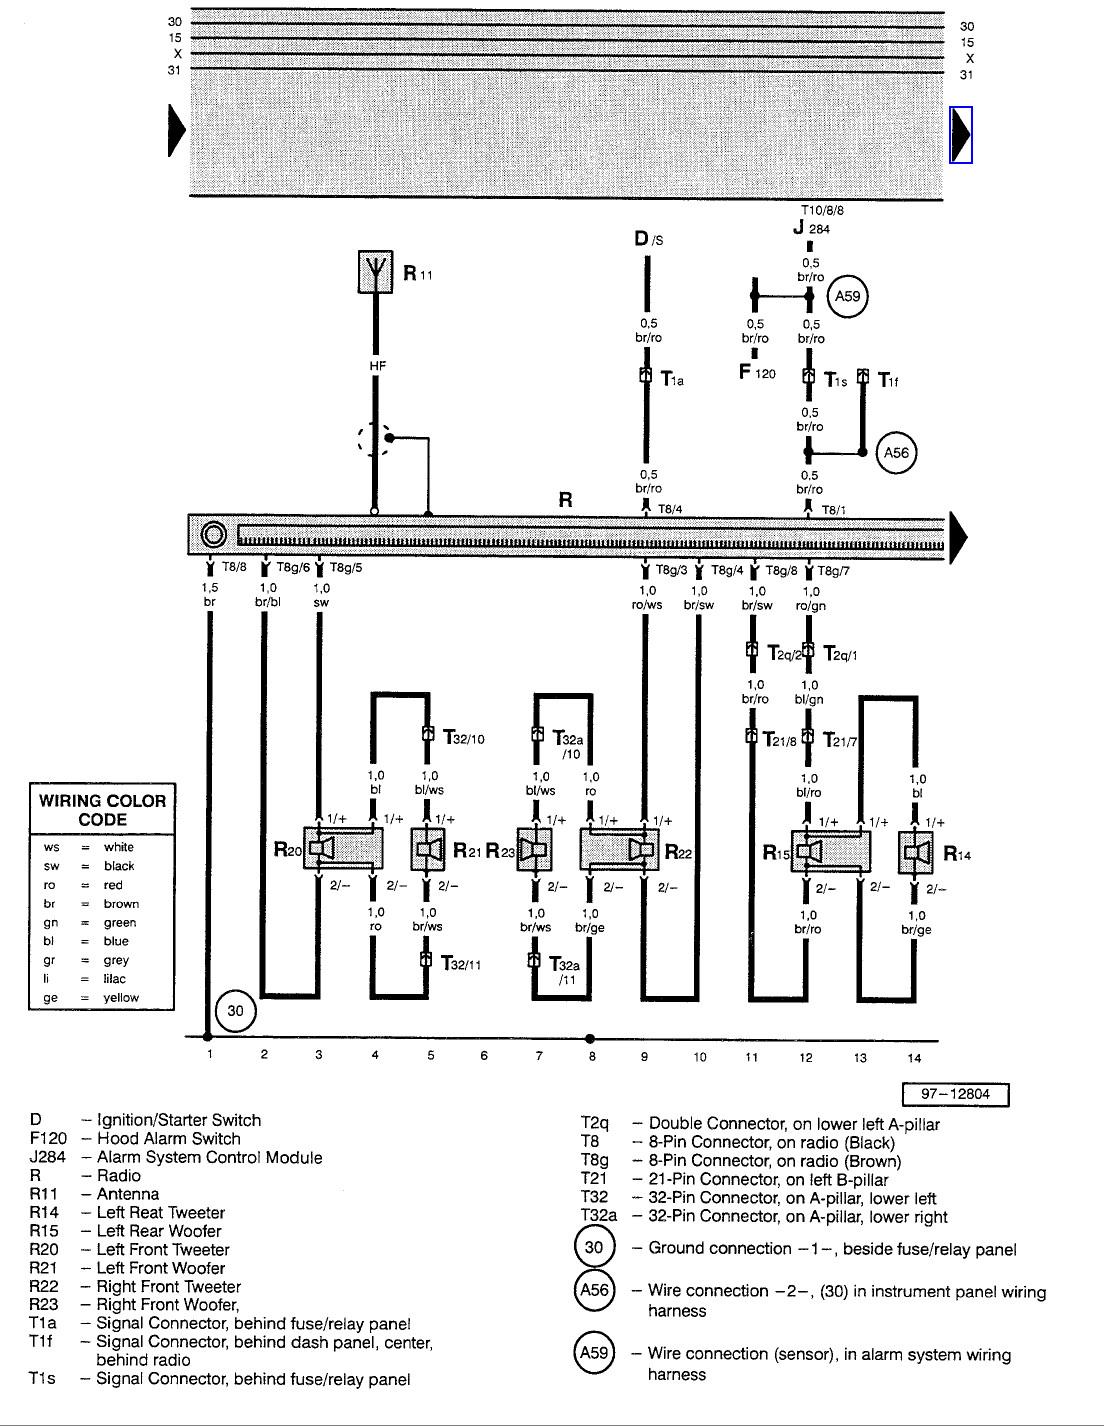 2013 Jetta Wiring Diagram - 20r Wiring Diagram for Wiring ...